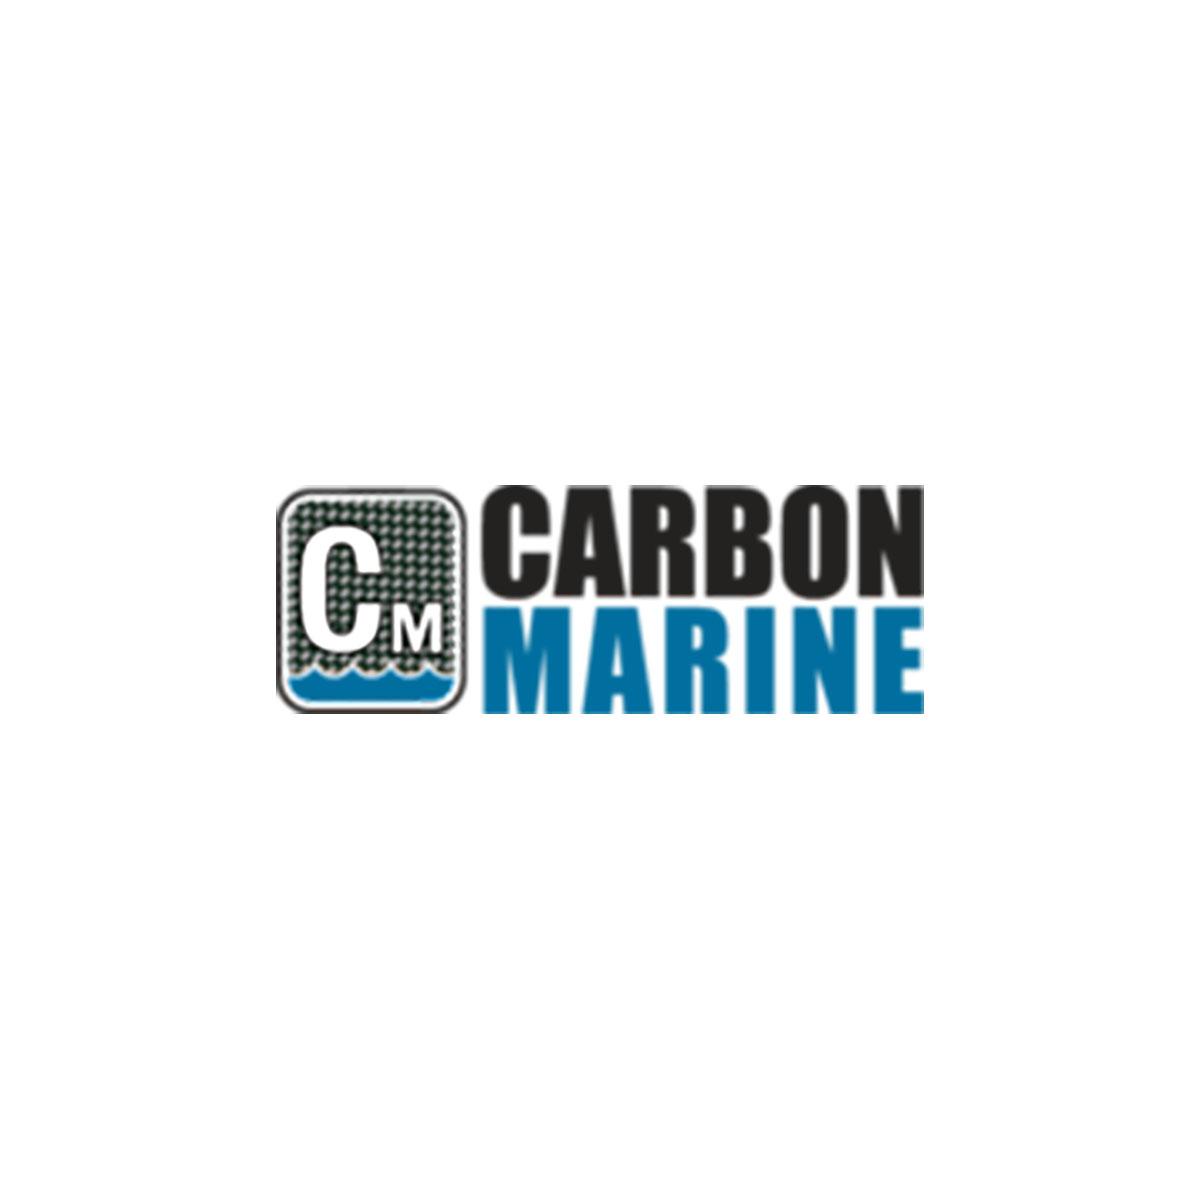 CarbonMarine_Sized.jpg